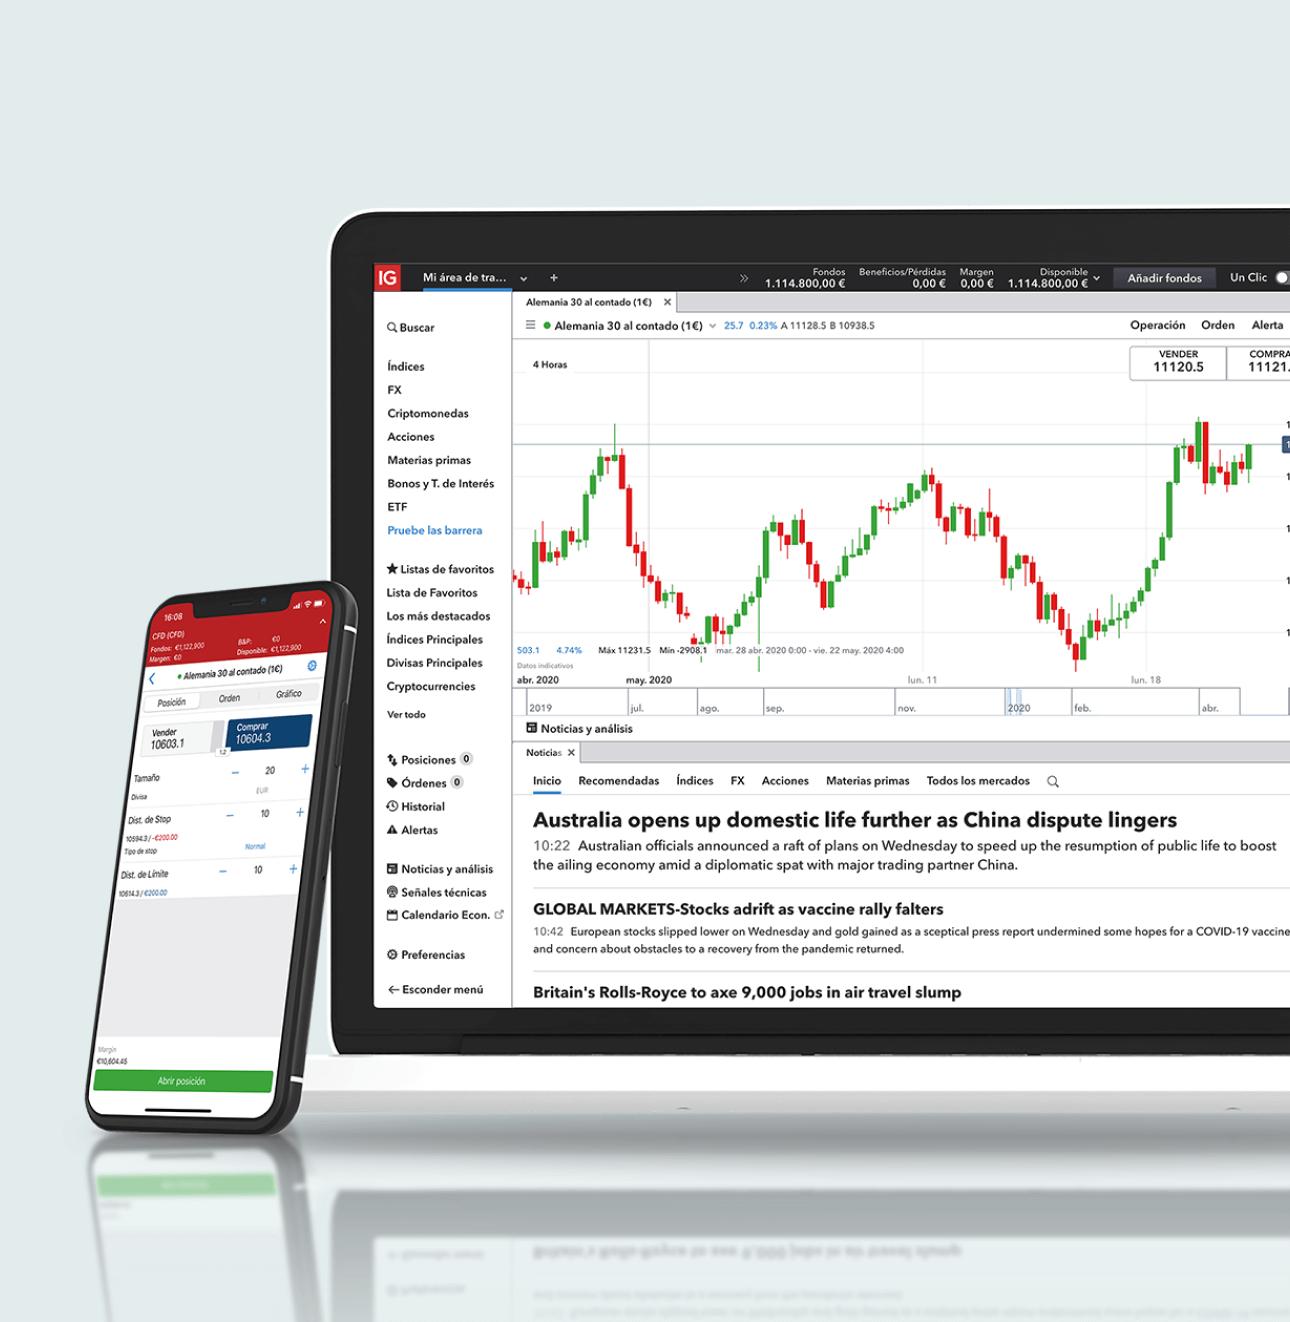 fusion dma trading platform demo